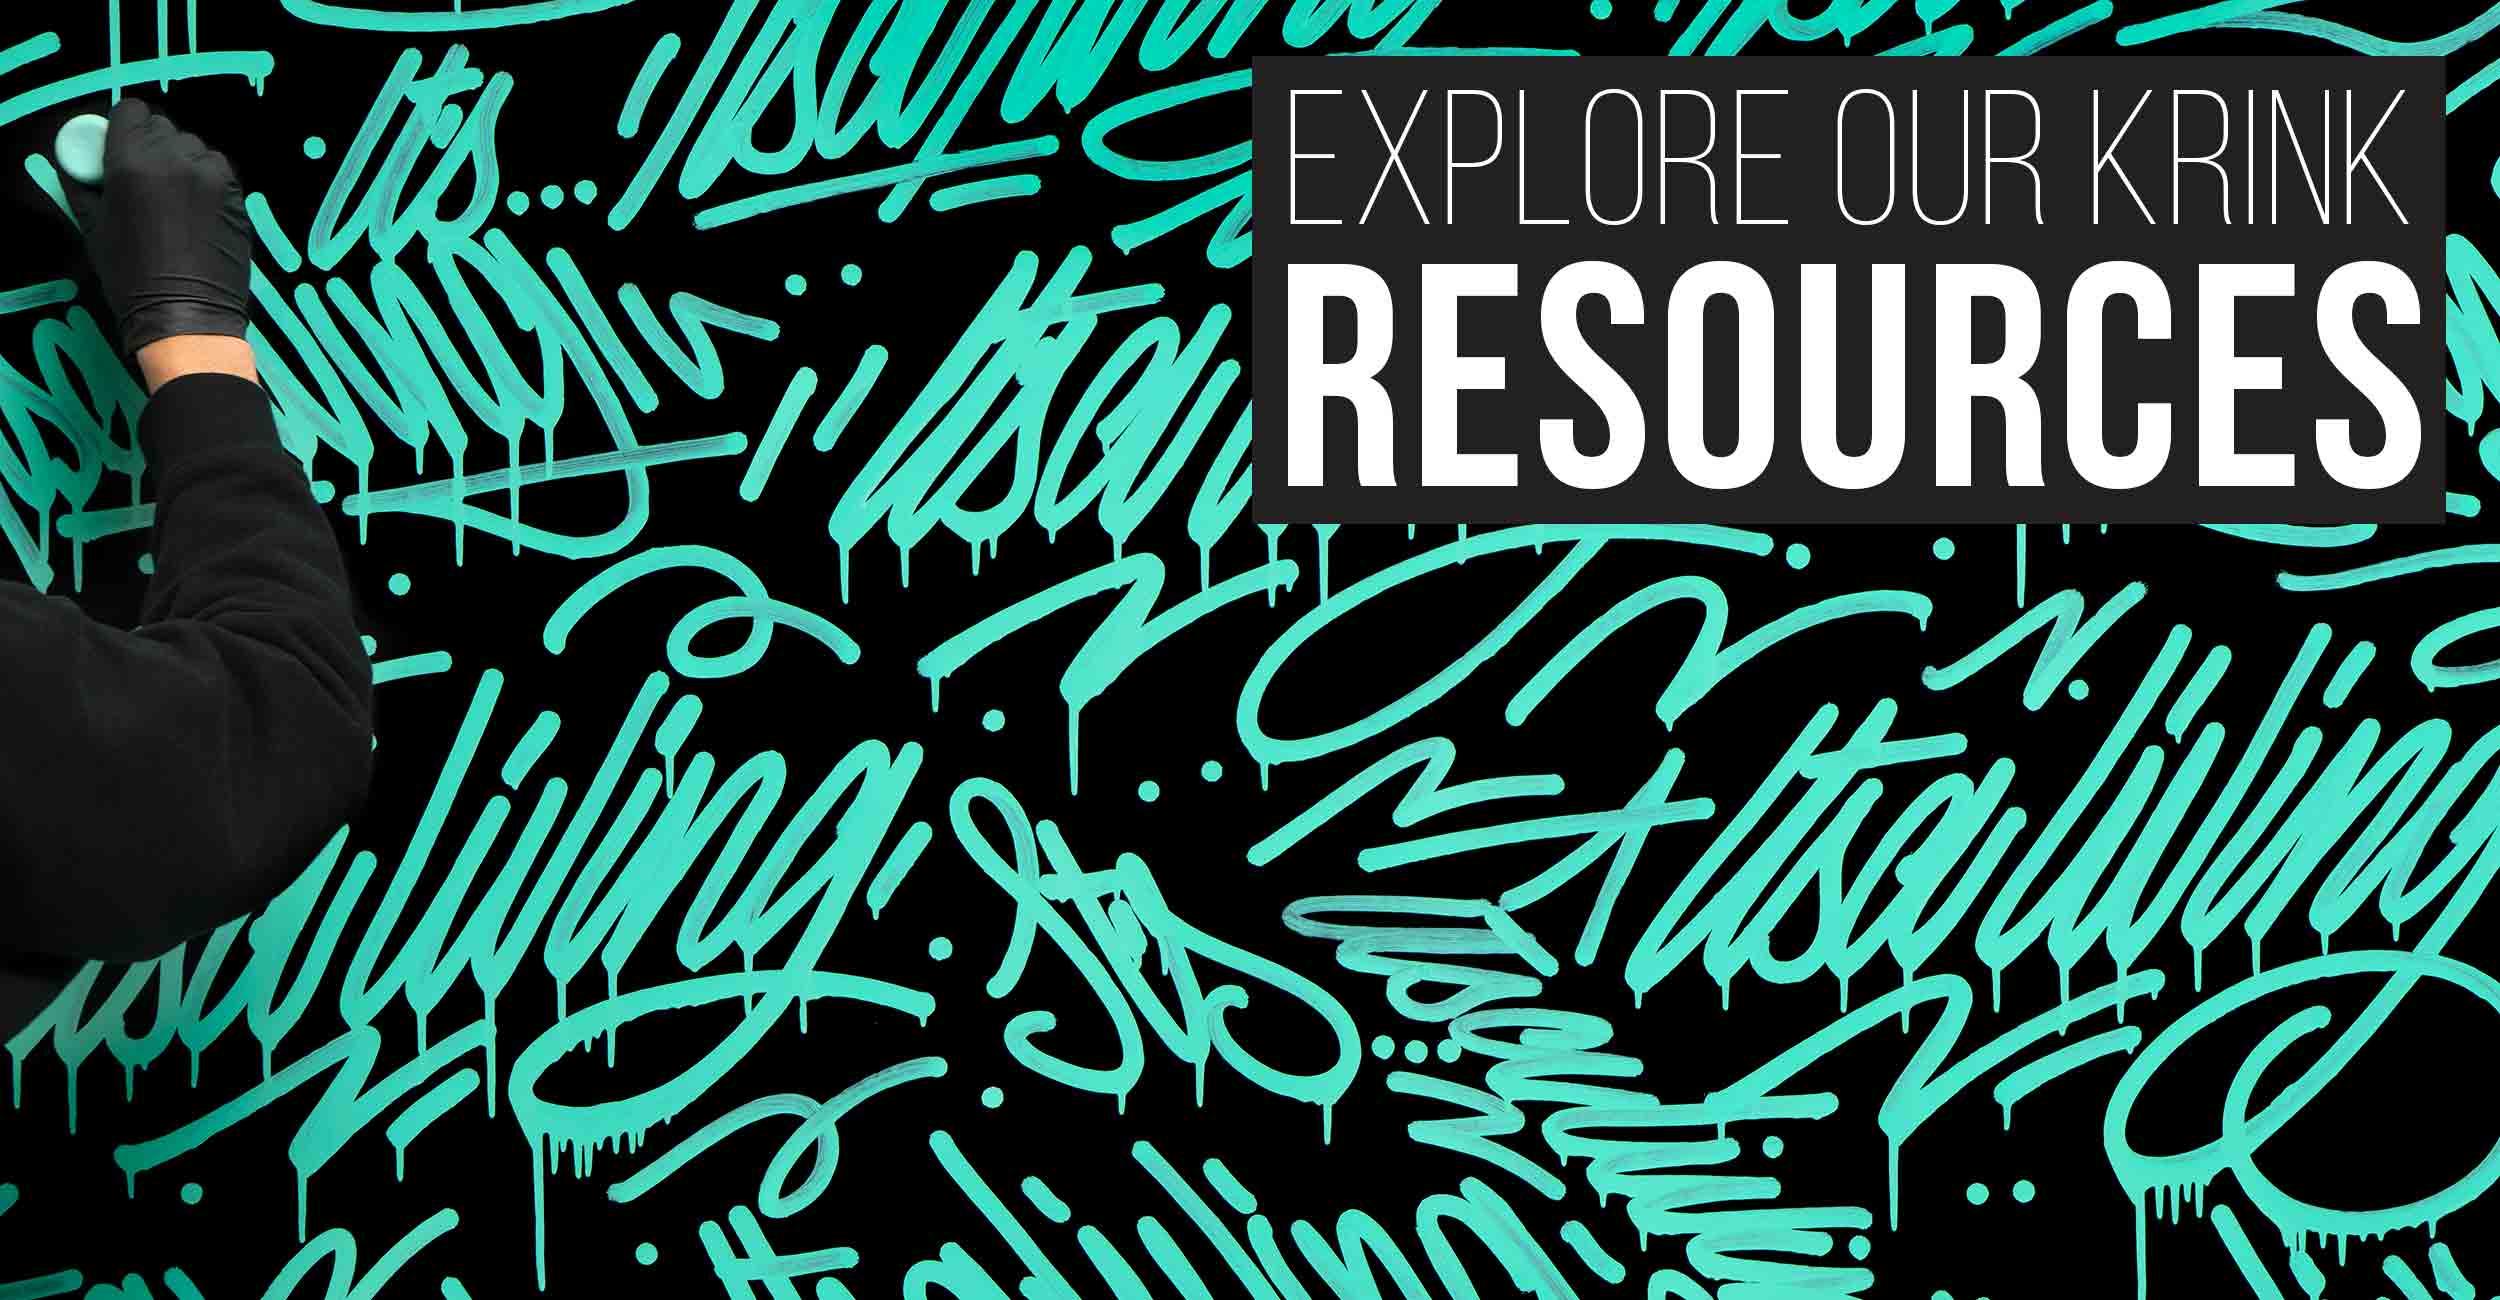 Krink_Resources.jpg